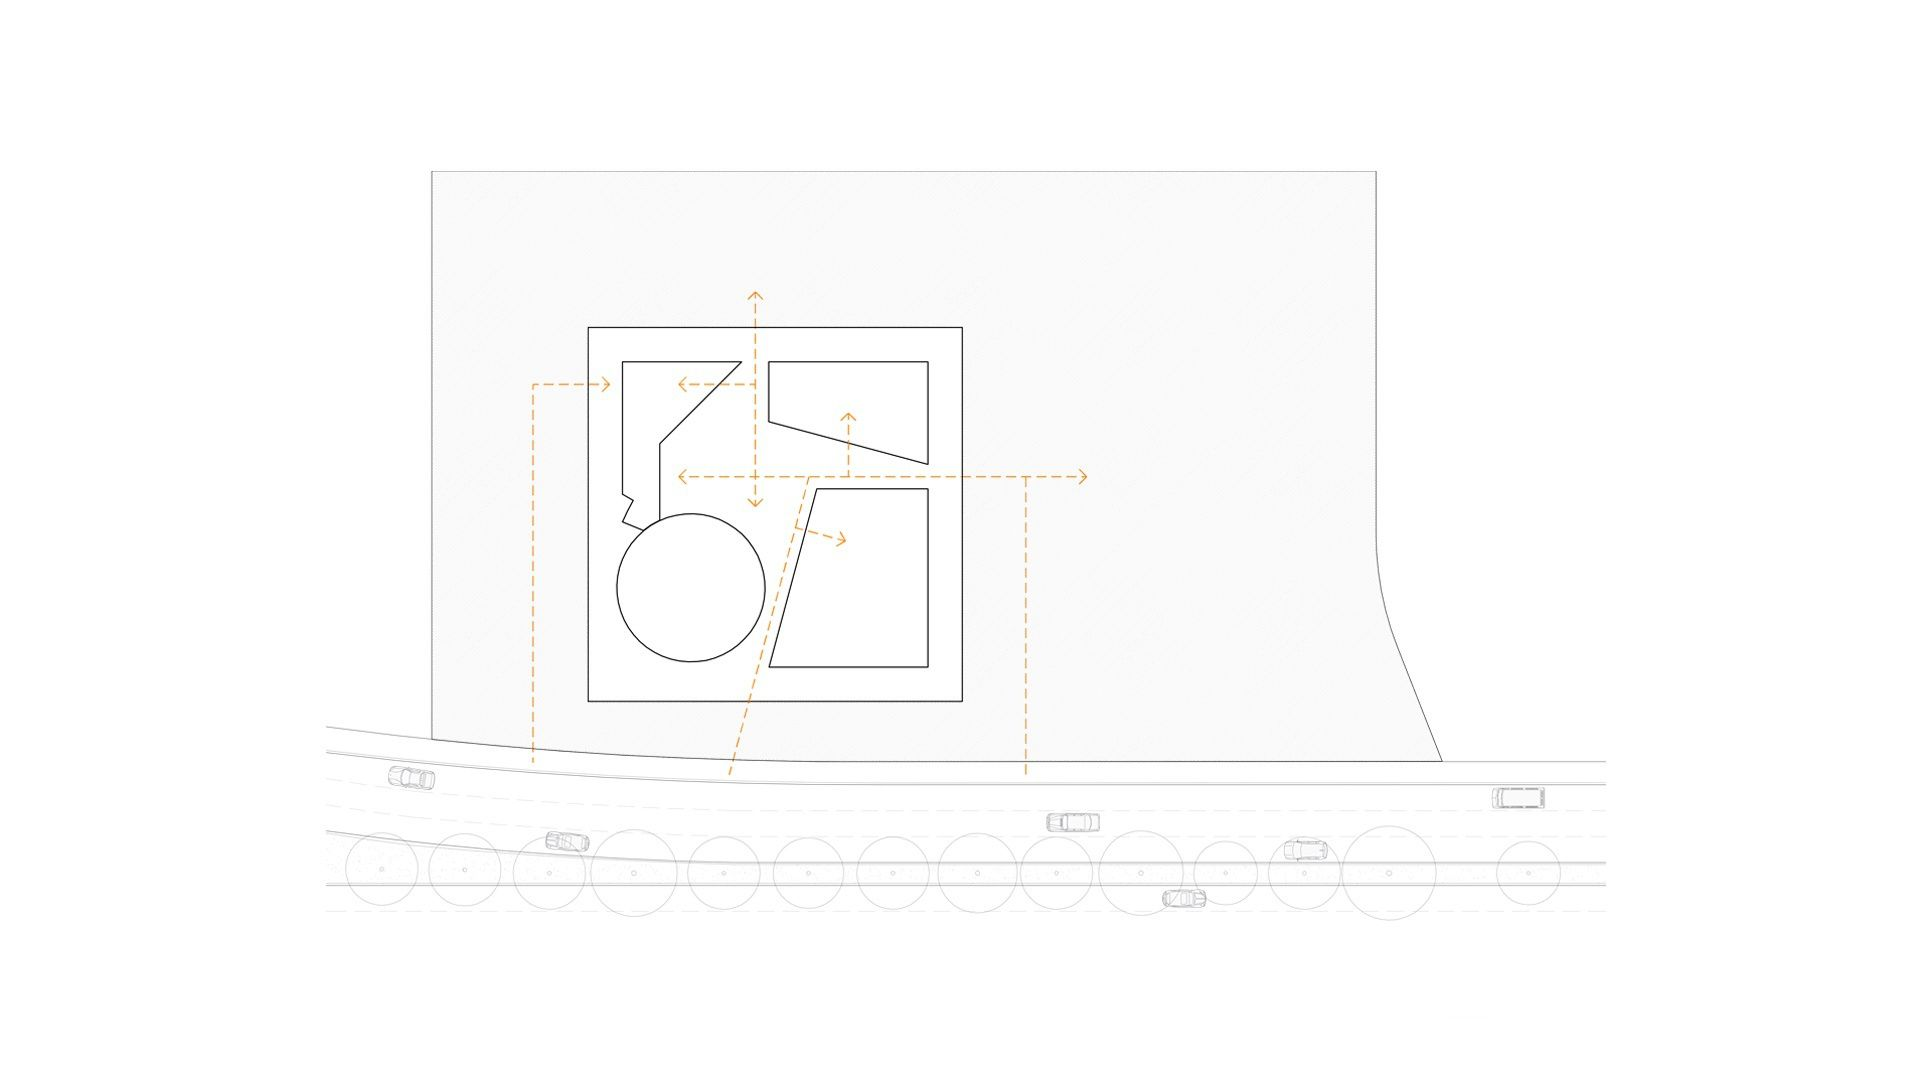 midiateca-santo-andre-diagrama-novos-acessos